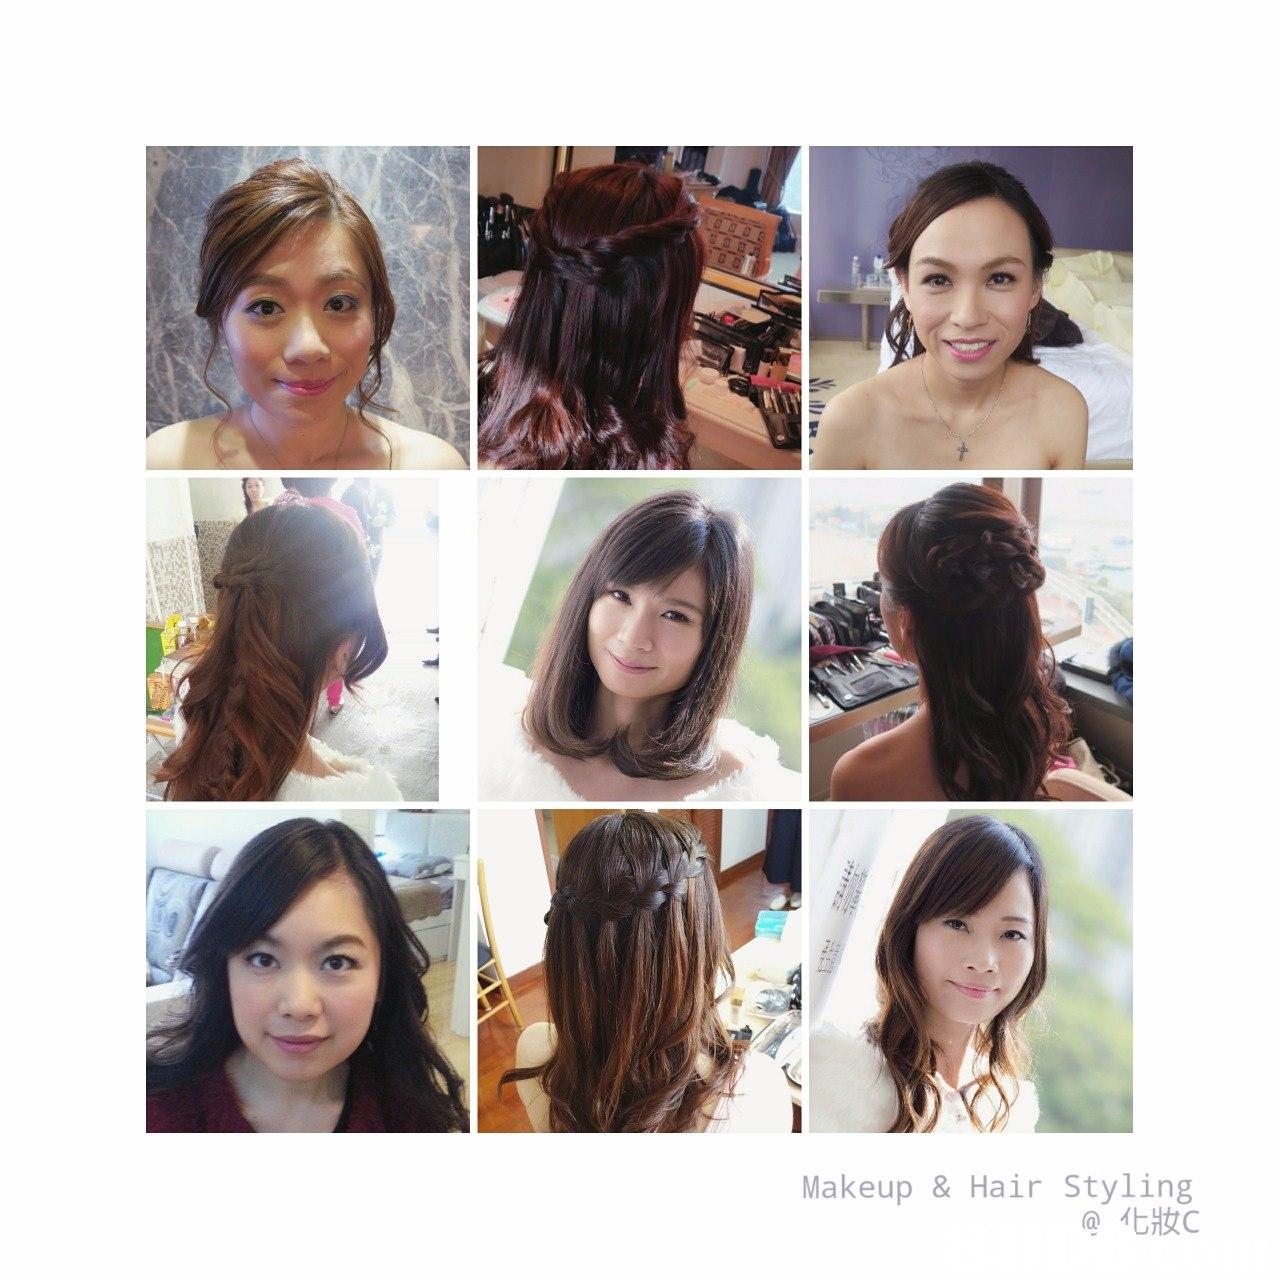 Makeup & Hair Styling @化妝C,hair,human hair color,hairstyle,hair accessory,fashion accessory